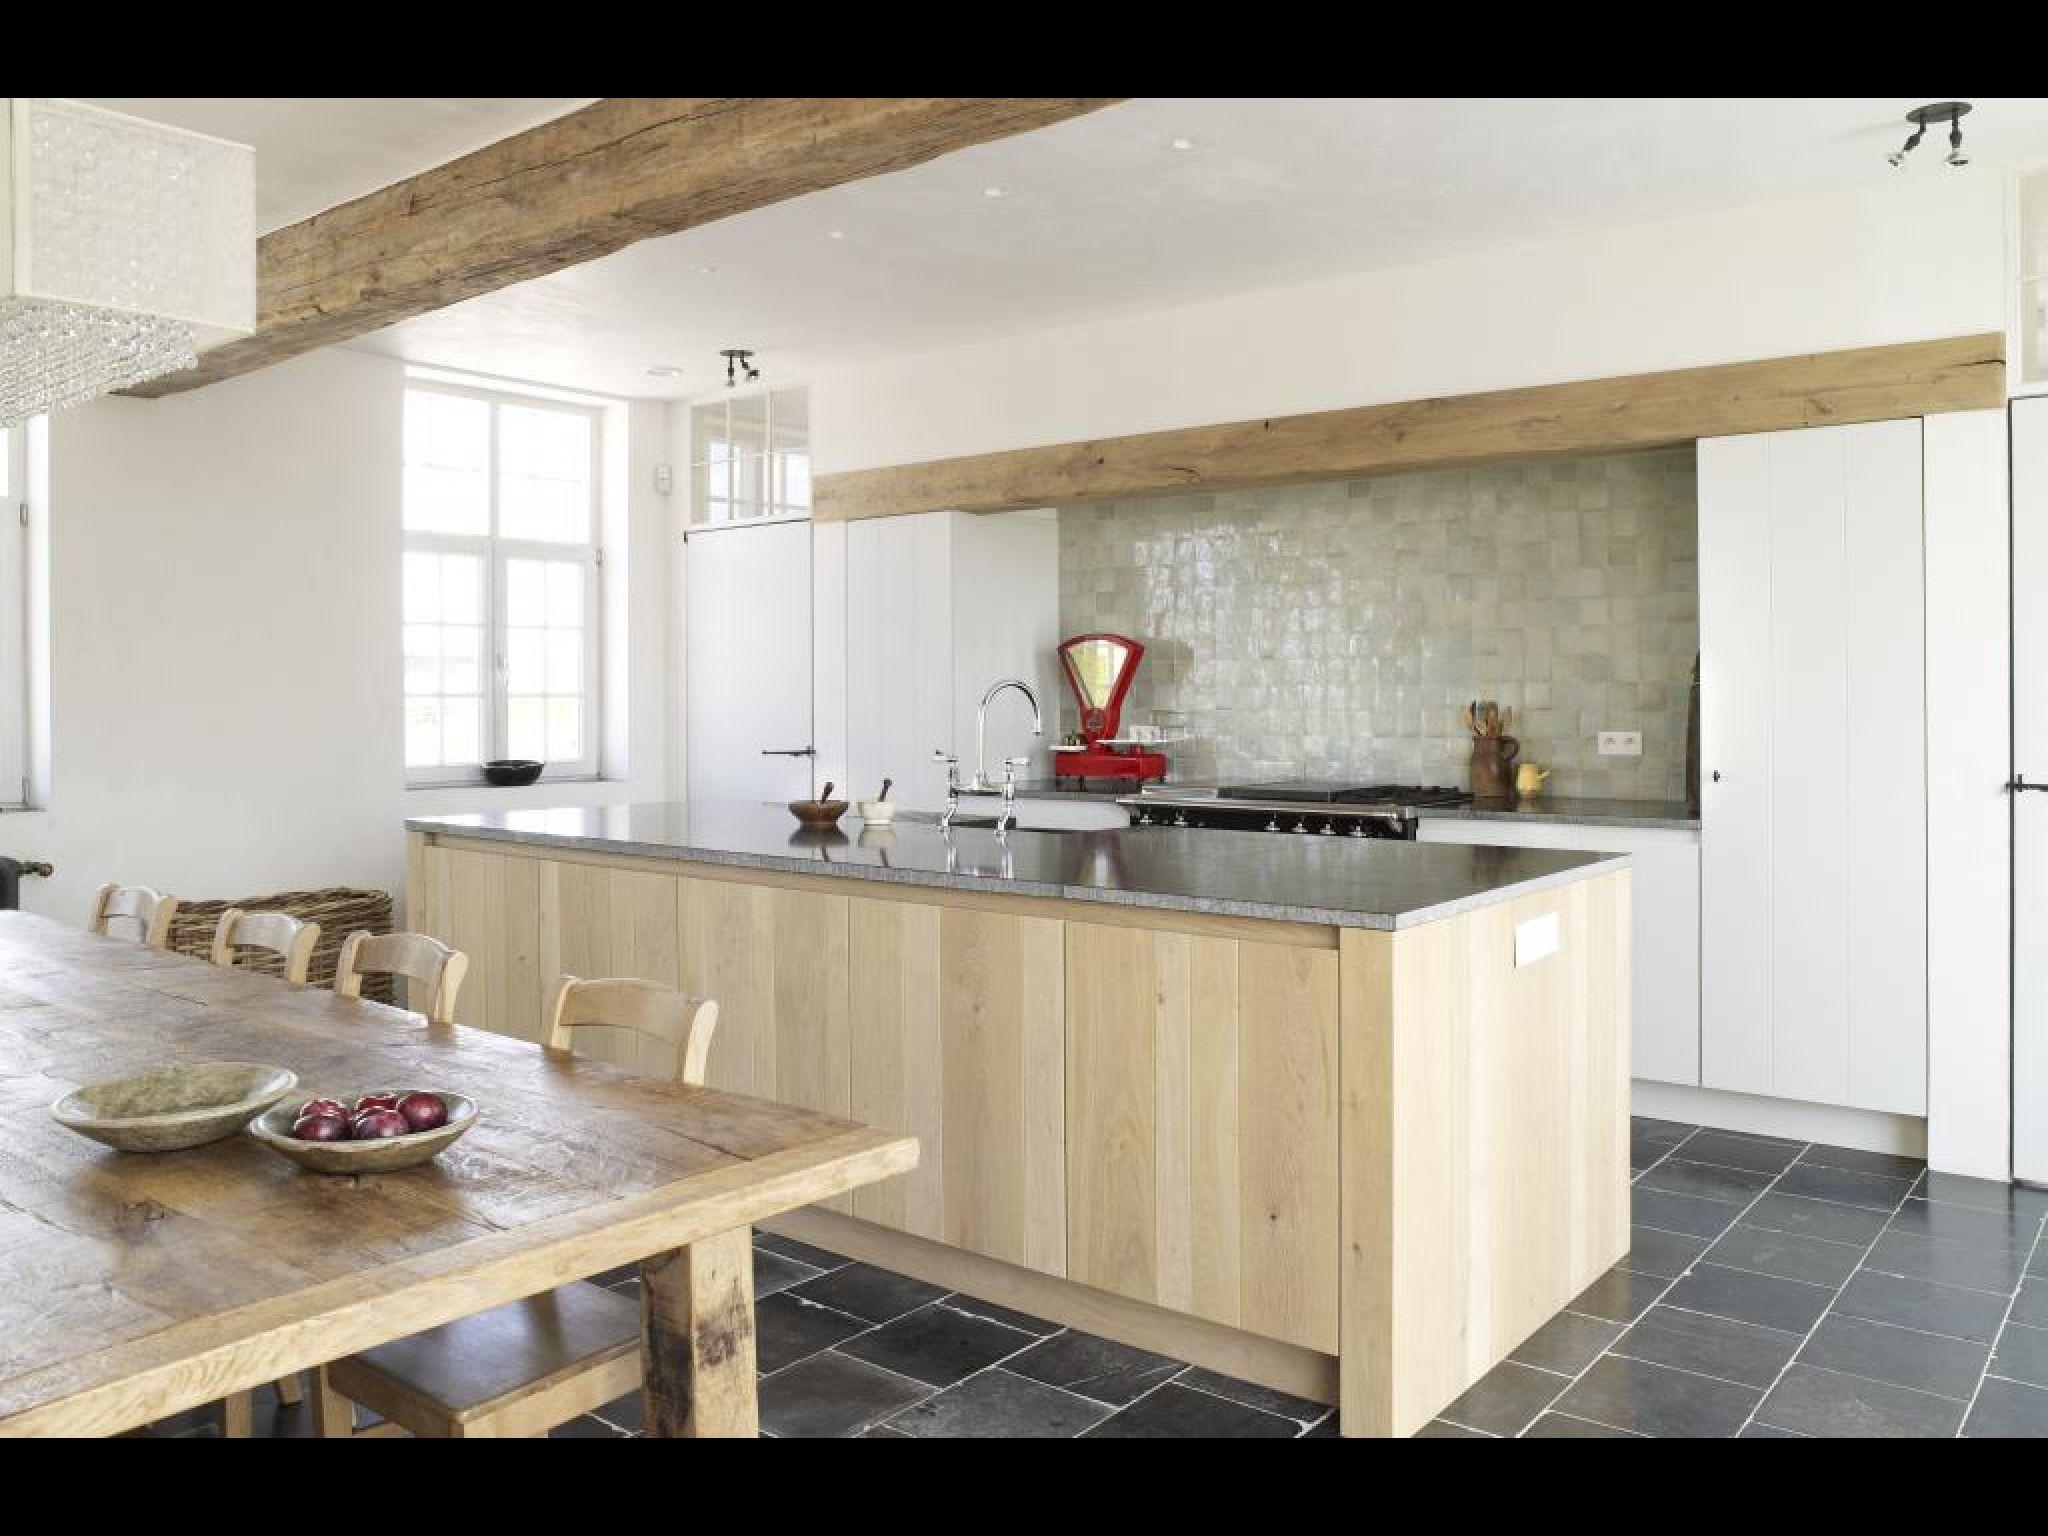 Landelijk modern landelijk strak 1 houtenbalk in de keuken house kasp pinterest - Modern keukenplan ...